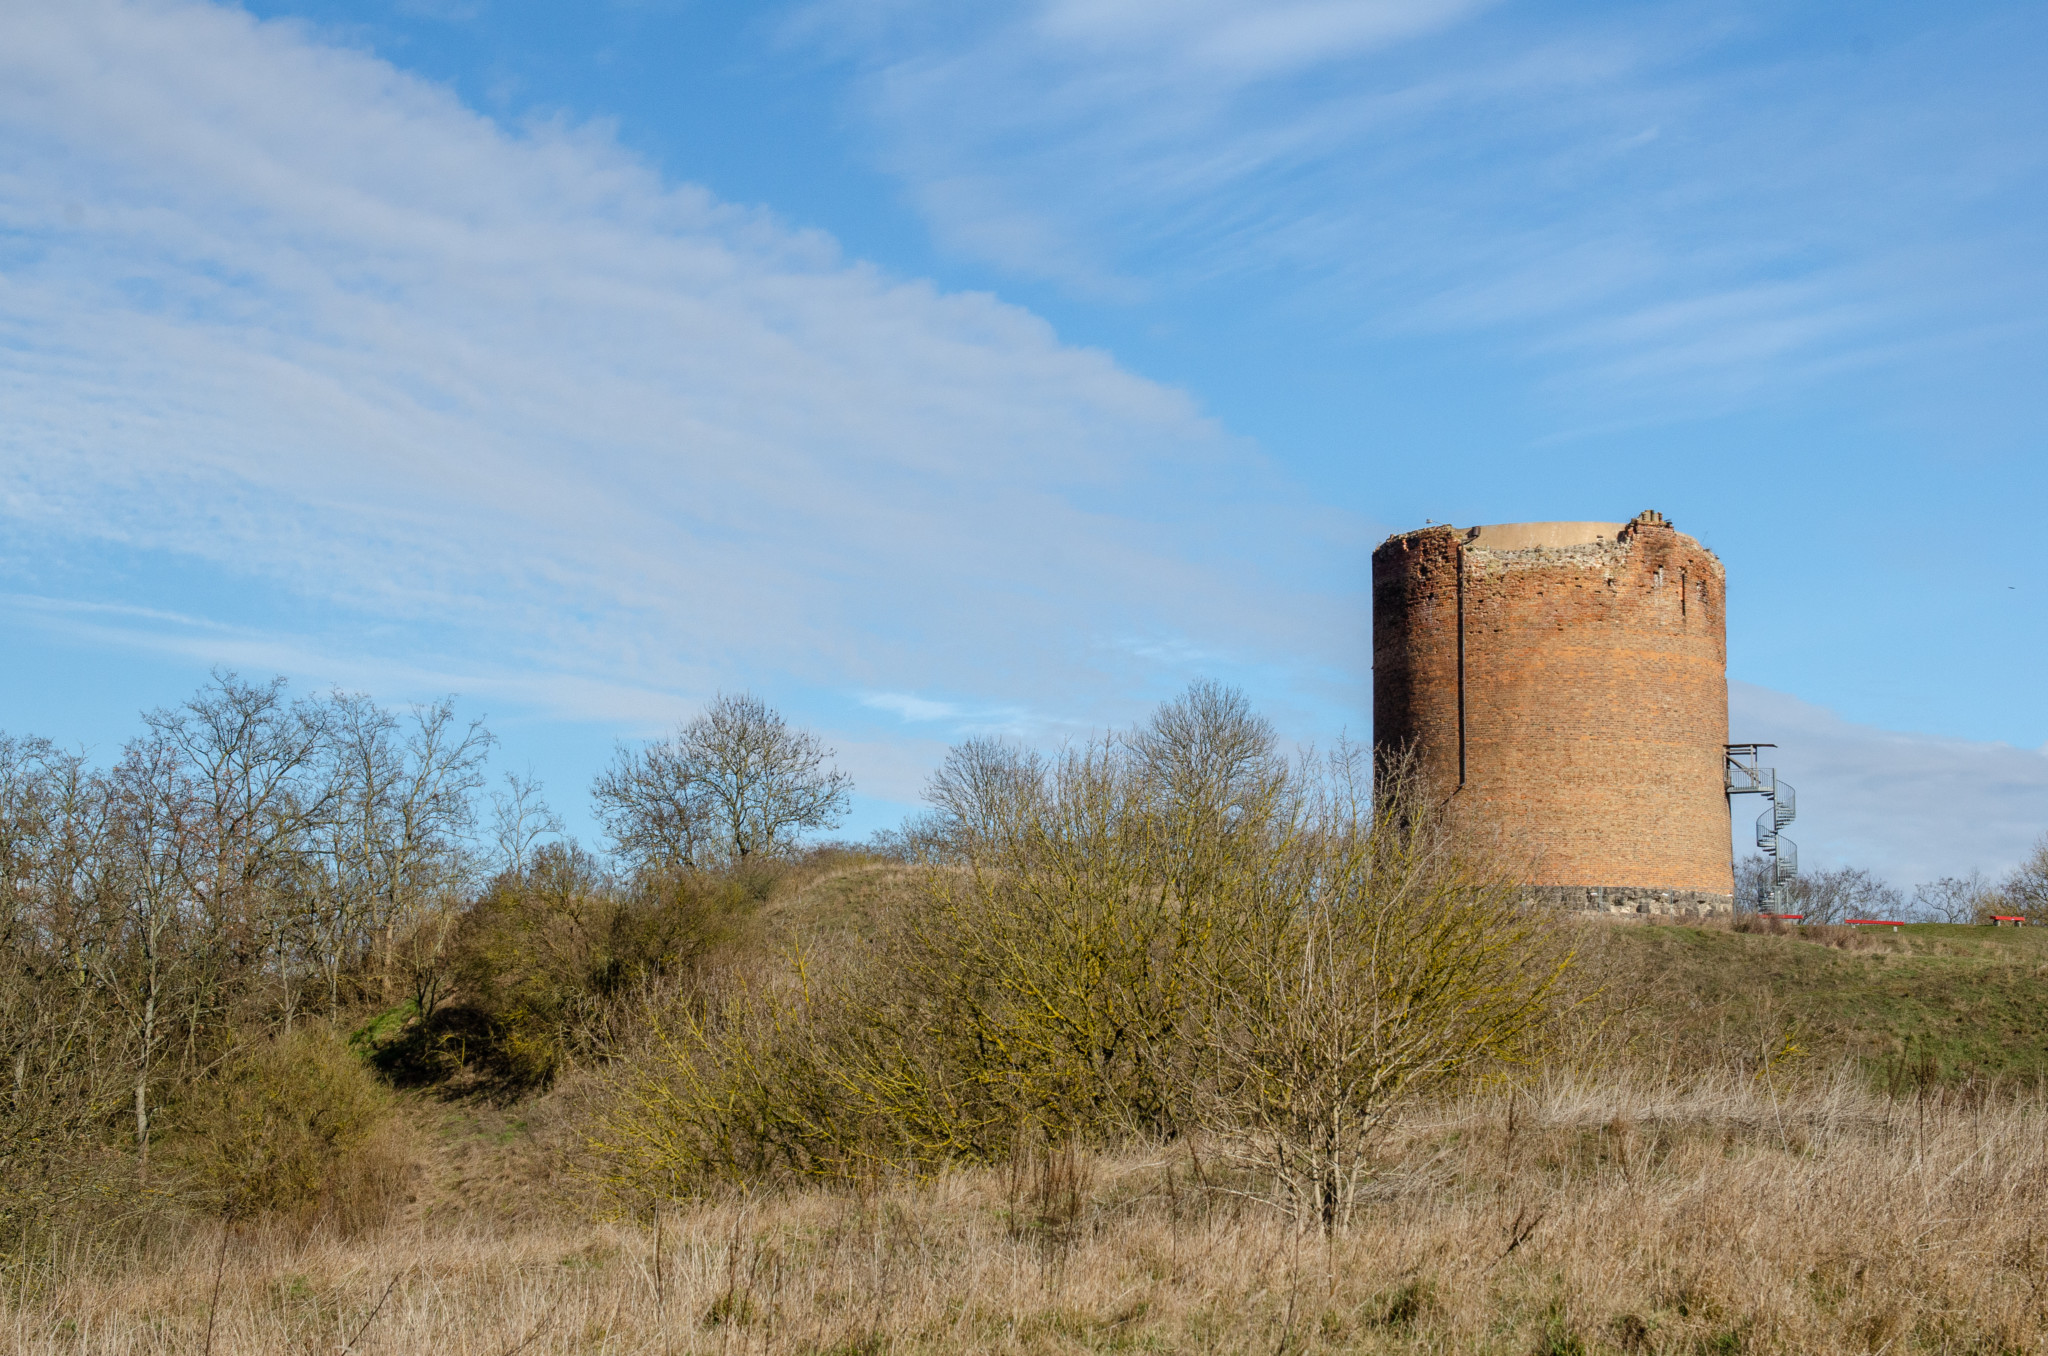 Stolpe Turm in Stützkow in der Uckermark